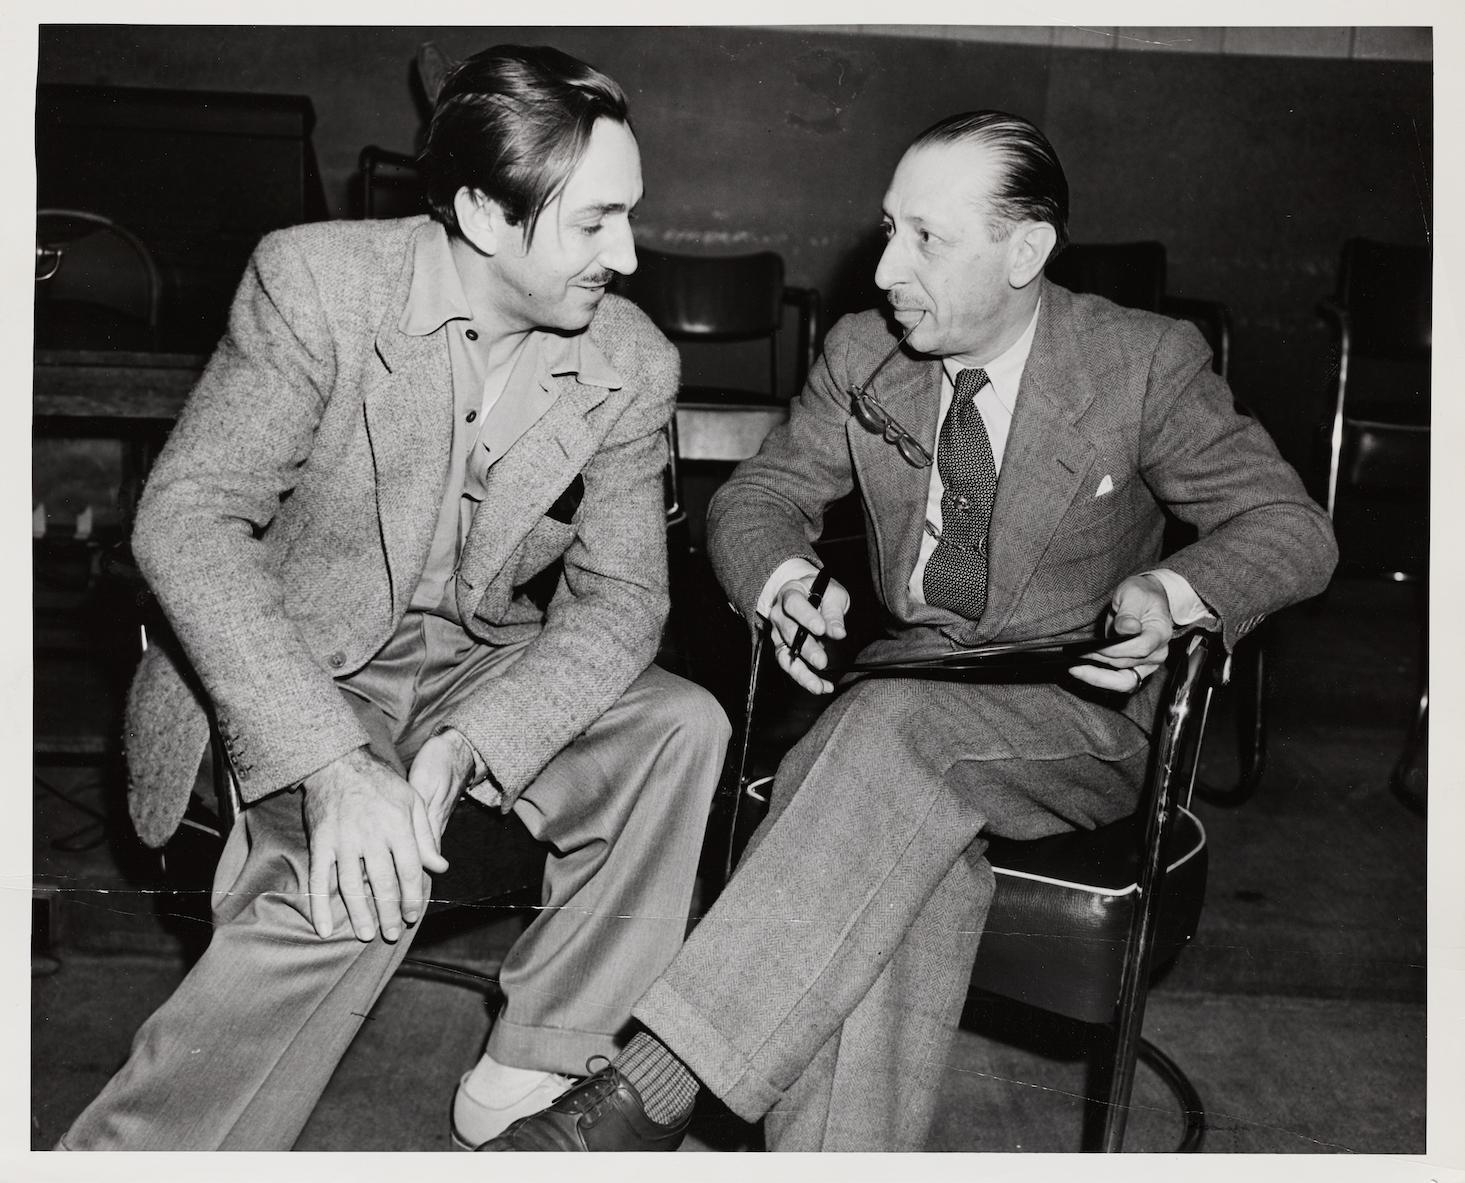 Walt Disney (left) with Igor Stravinsky in the year 1937. © Paul Sacher Stiftung